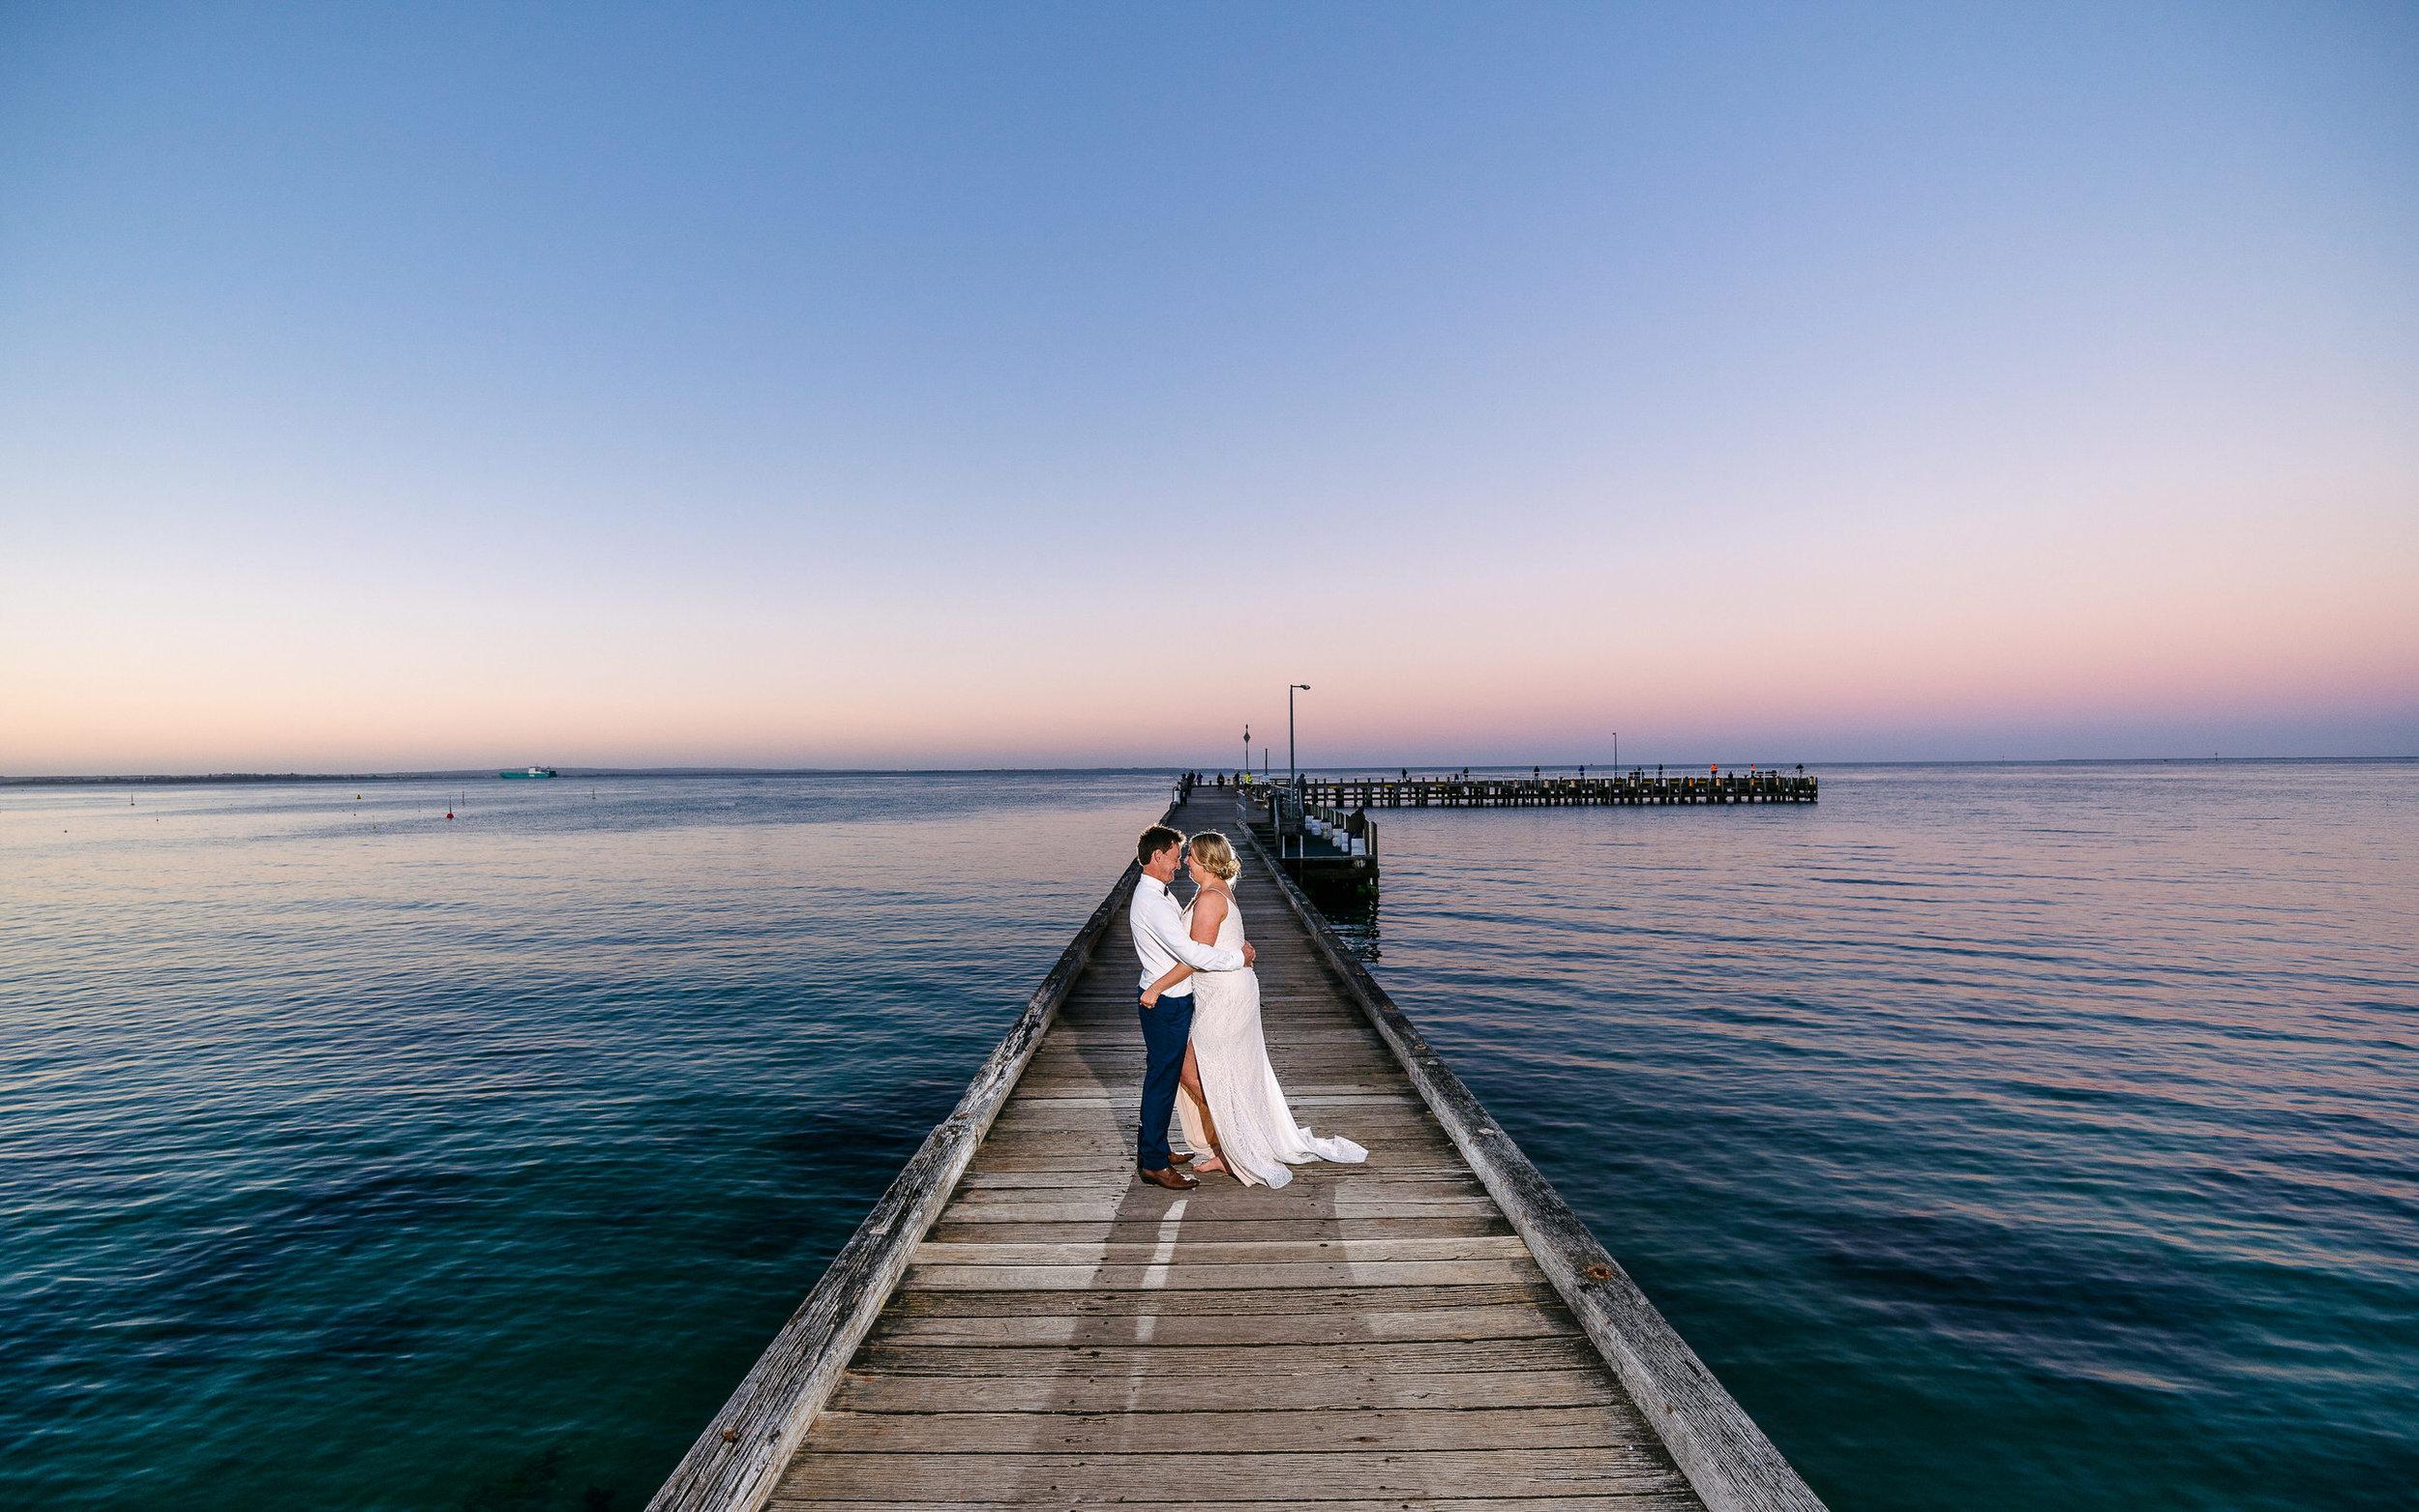 Justin_And_Jim_Photography_Portsea_Pub_Wedding80.JPG